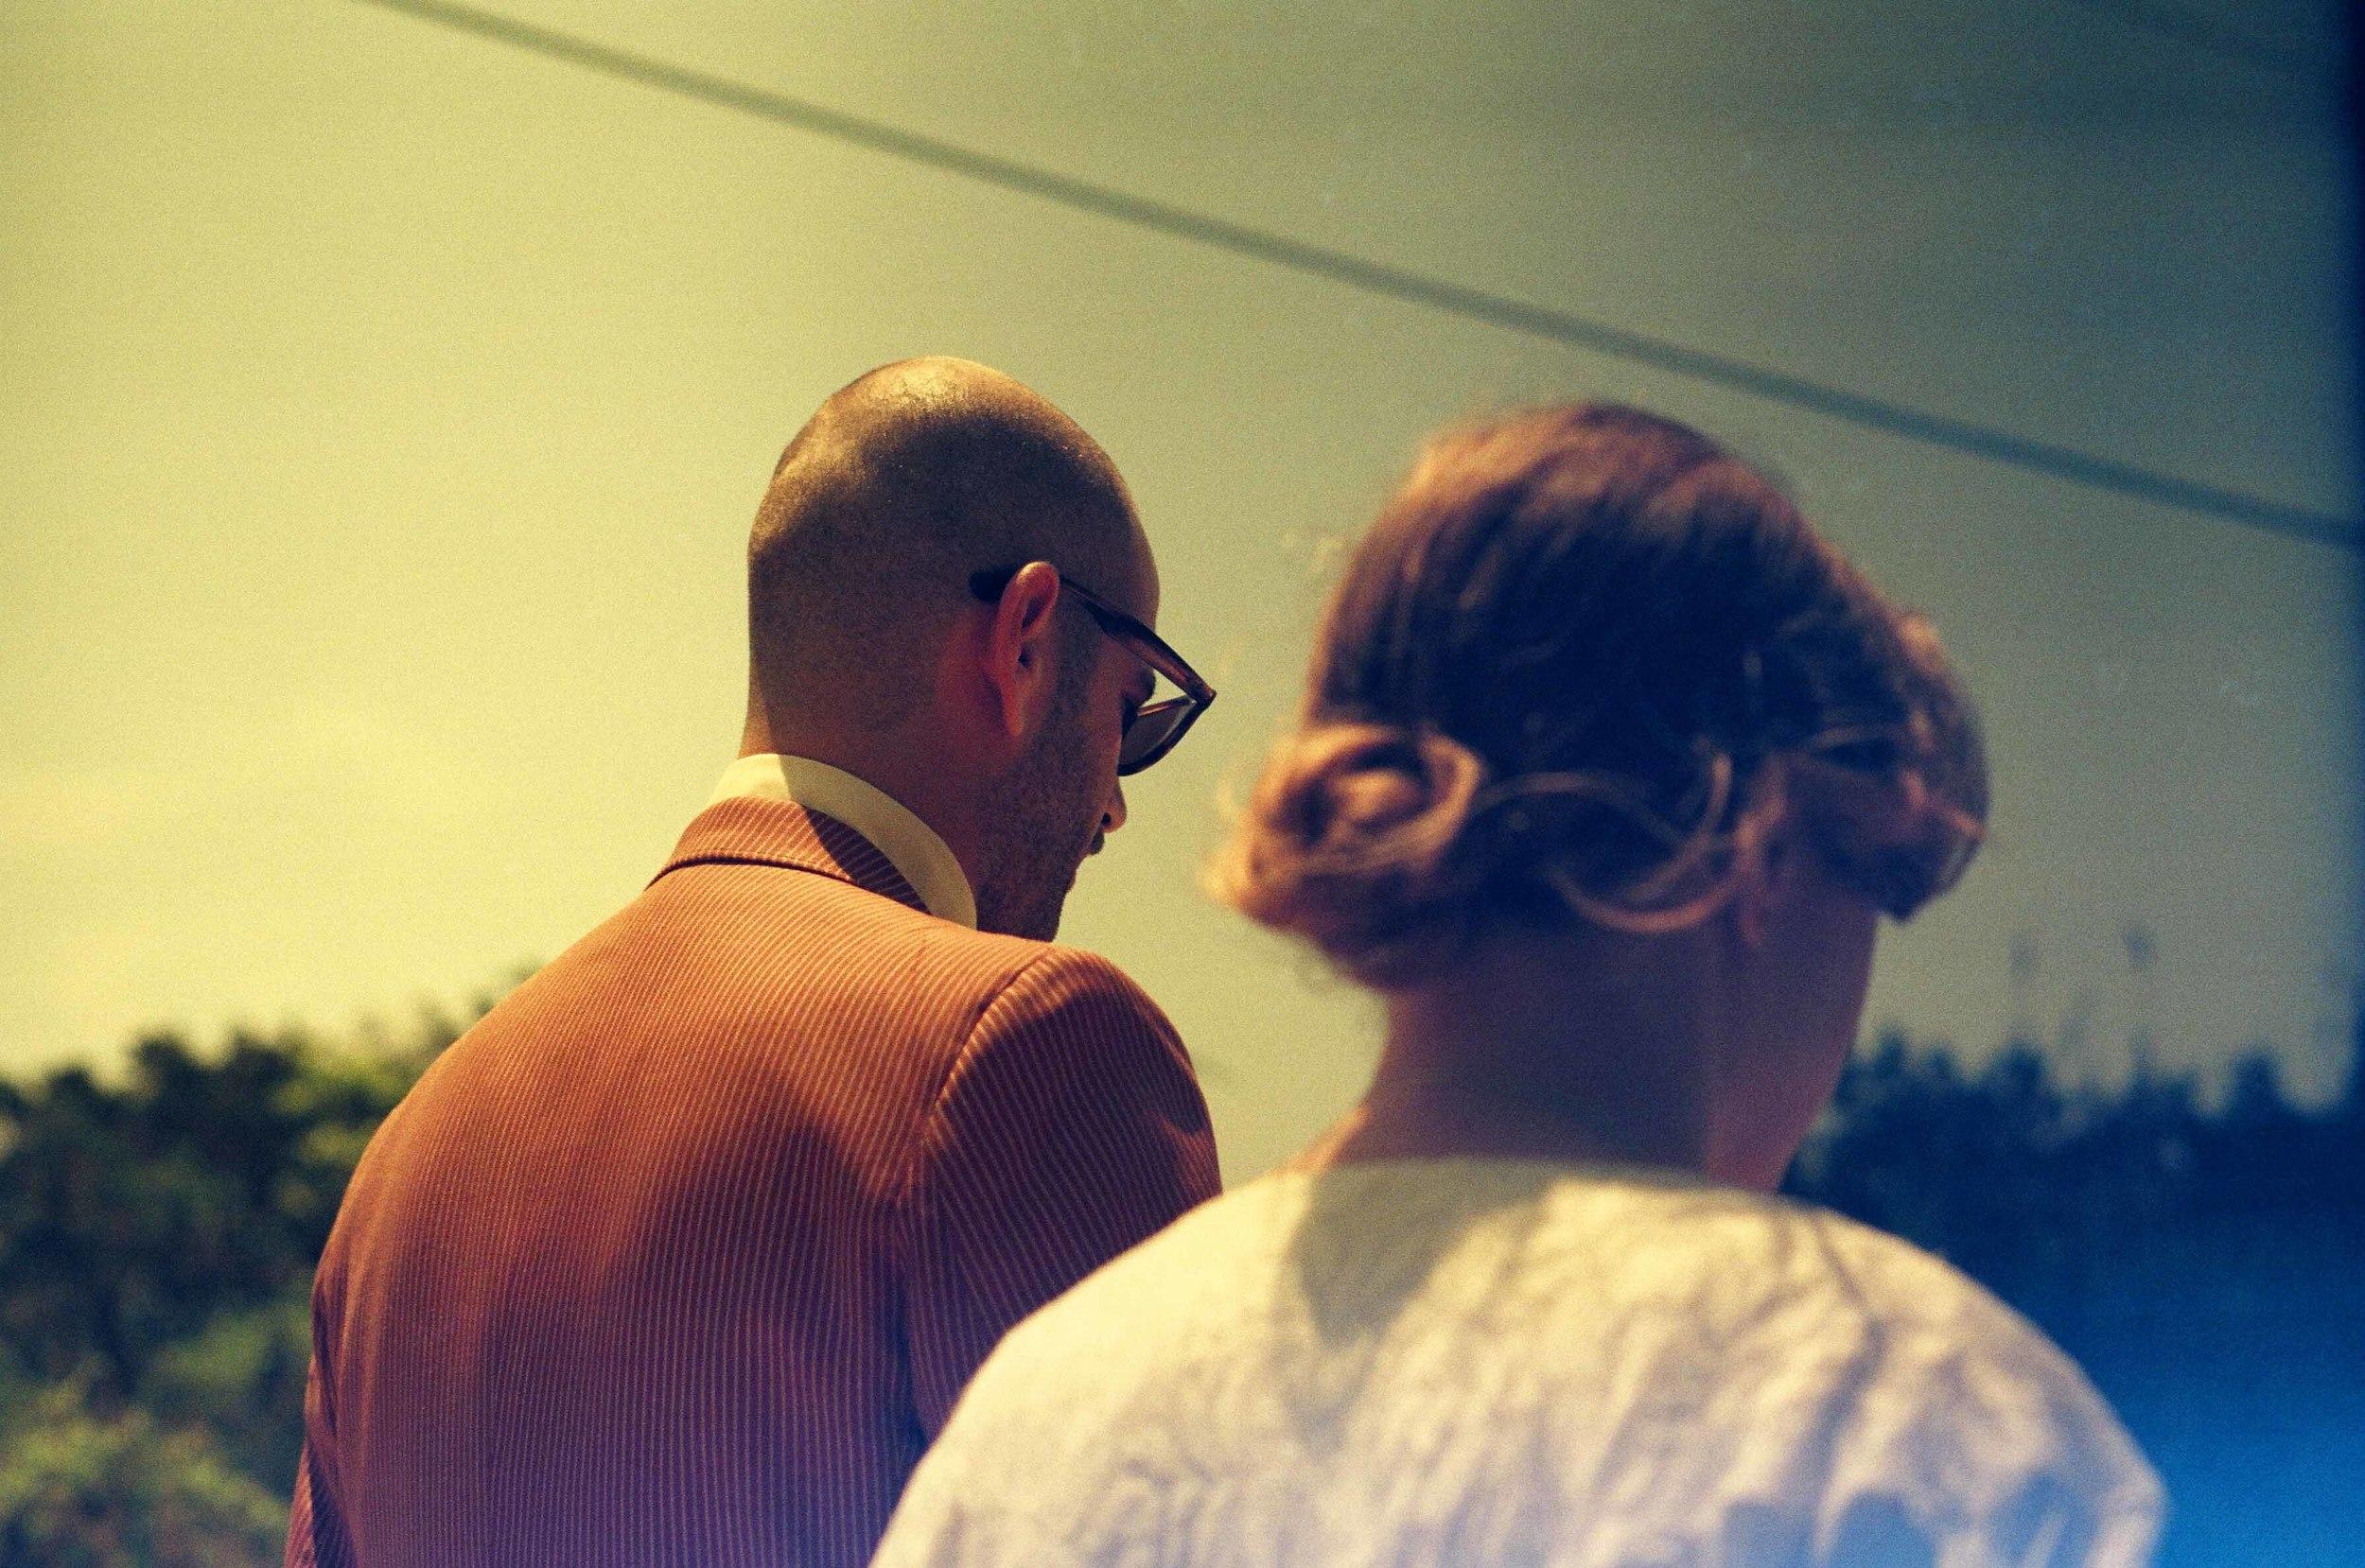 revolog kolor film wedding photography nyc brooklyn bohemian indie rock and roll wedding_ChelliseMichaelPhotography-17.jpg